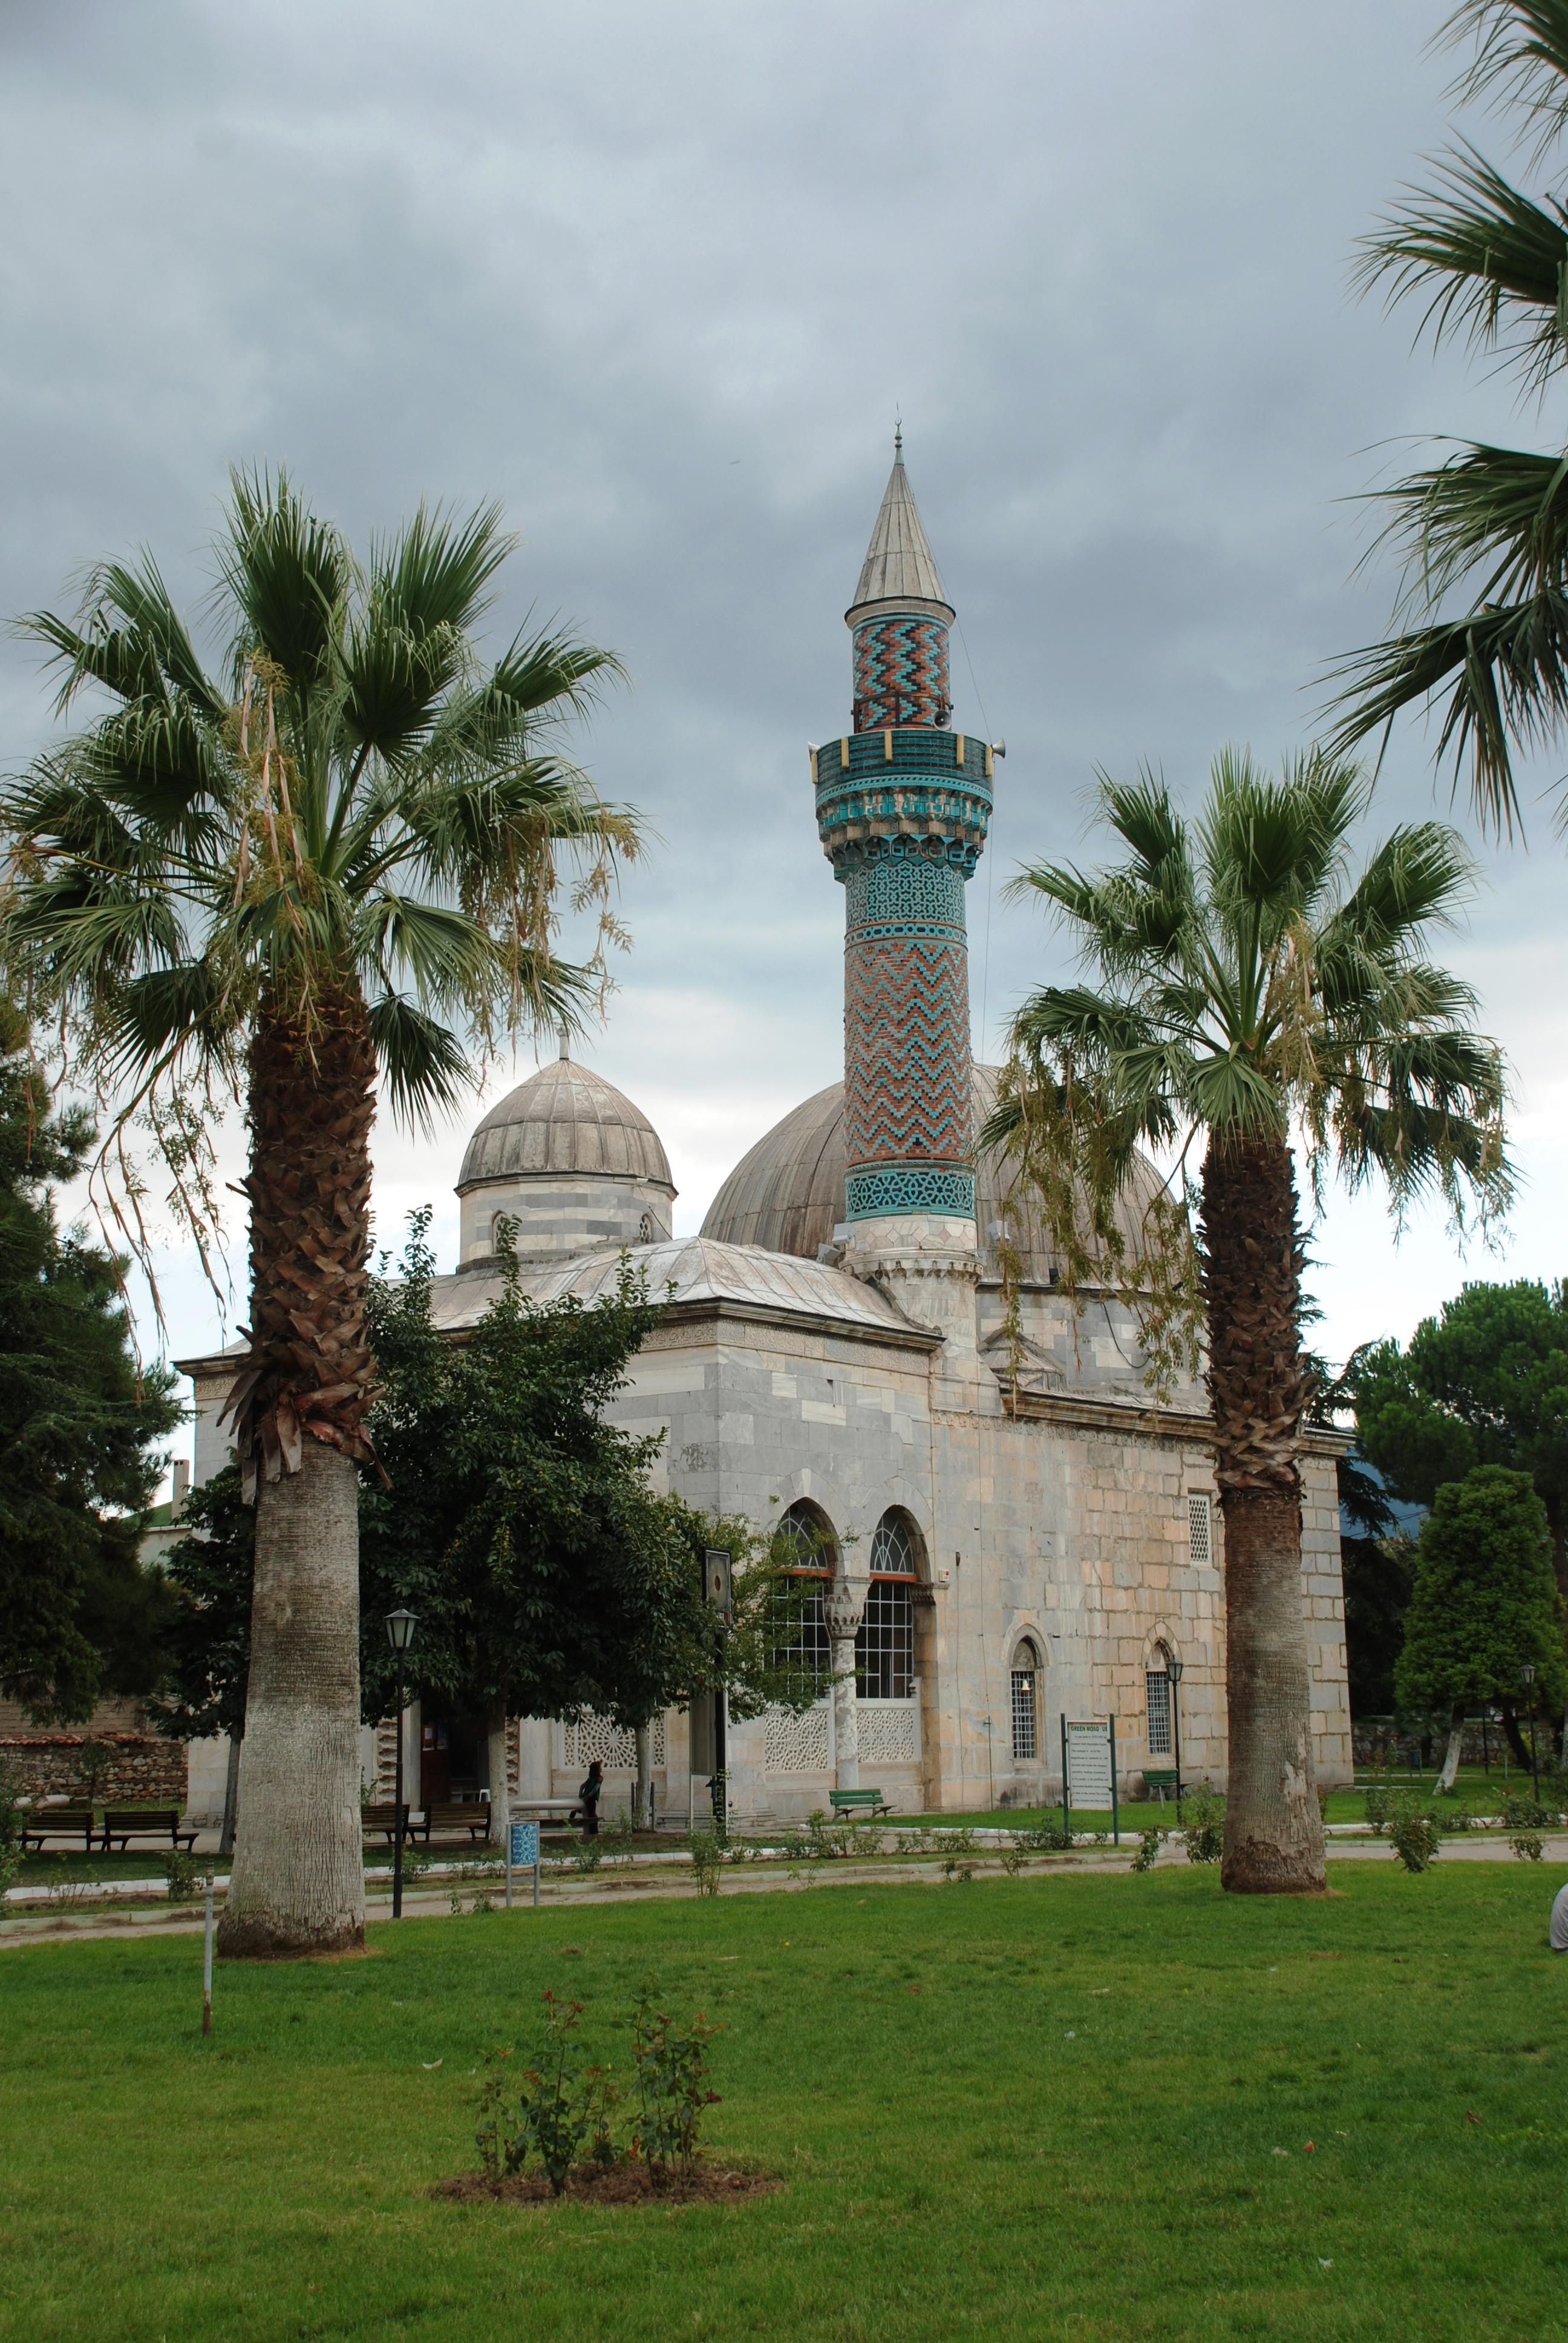 File:İznik Yeşil Cami.JPG - Wikimedia Commons